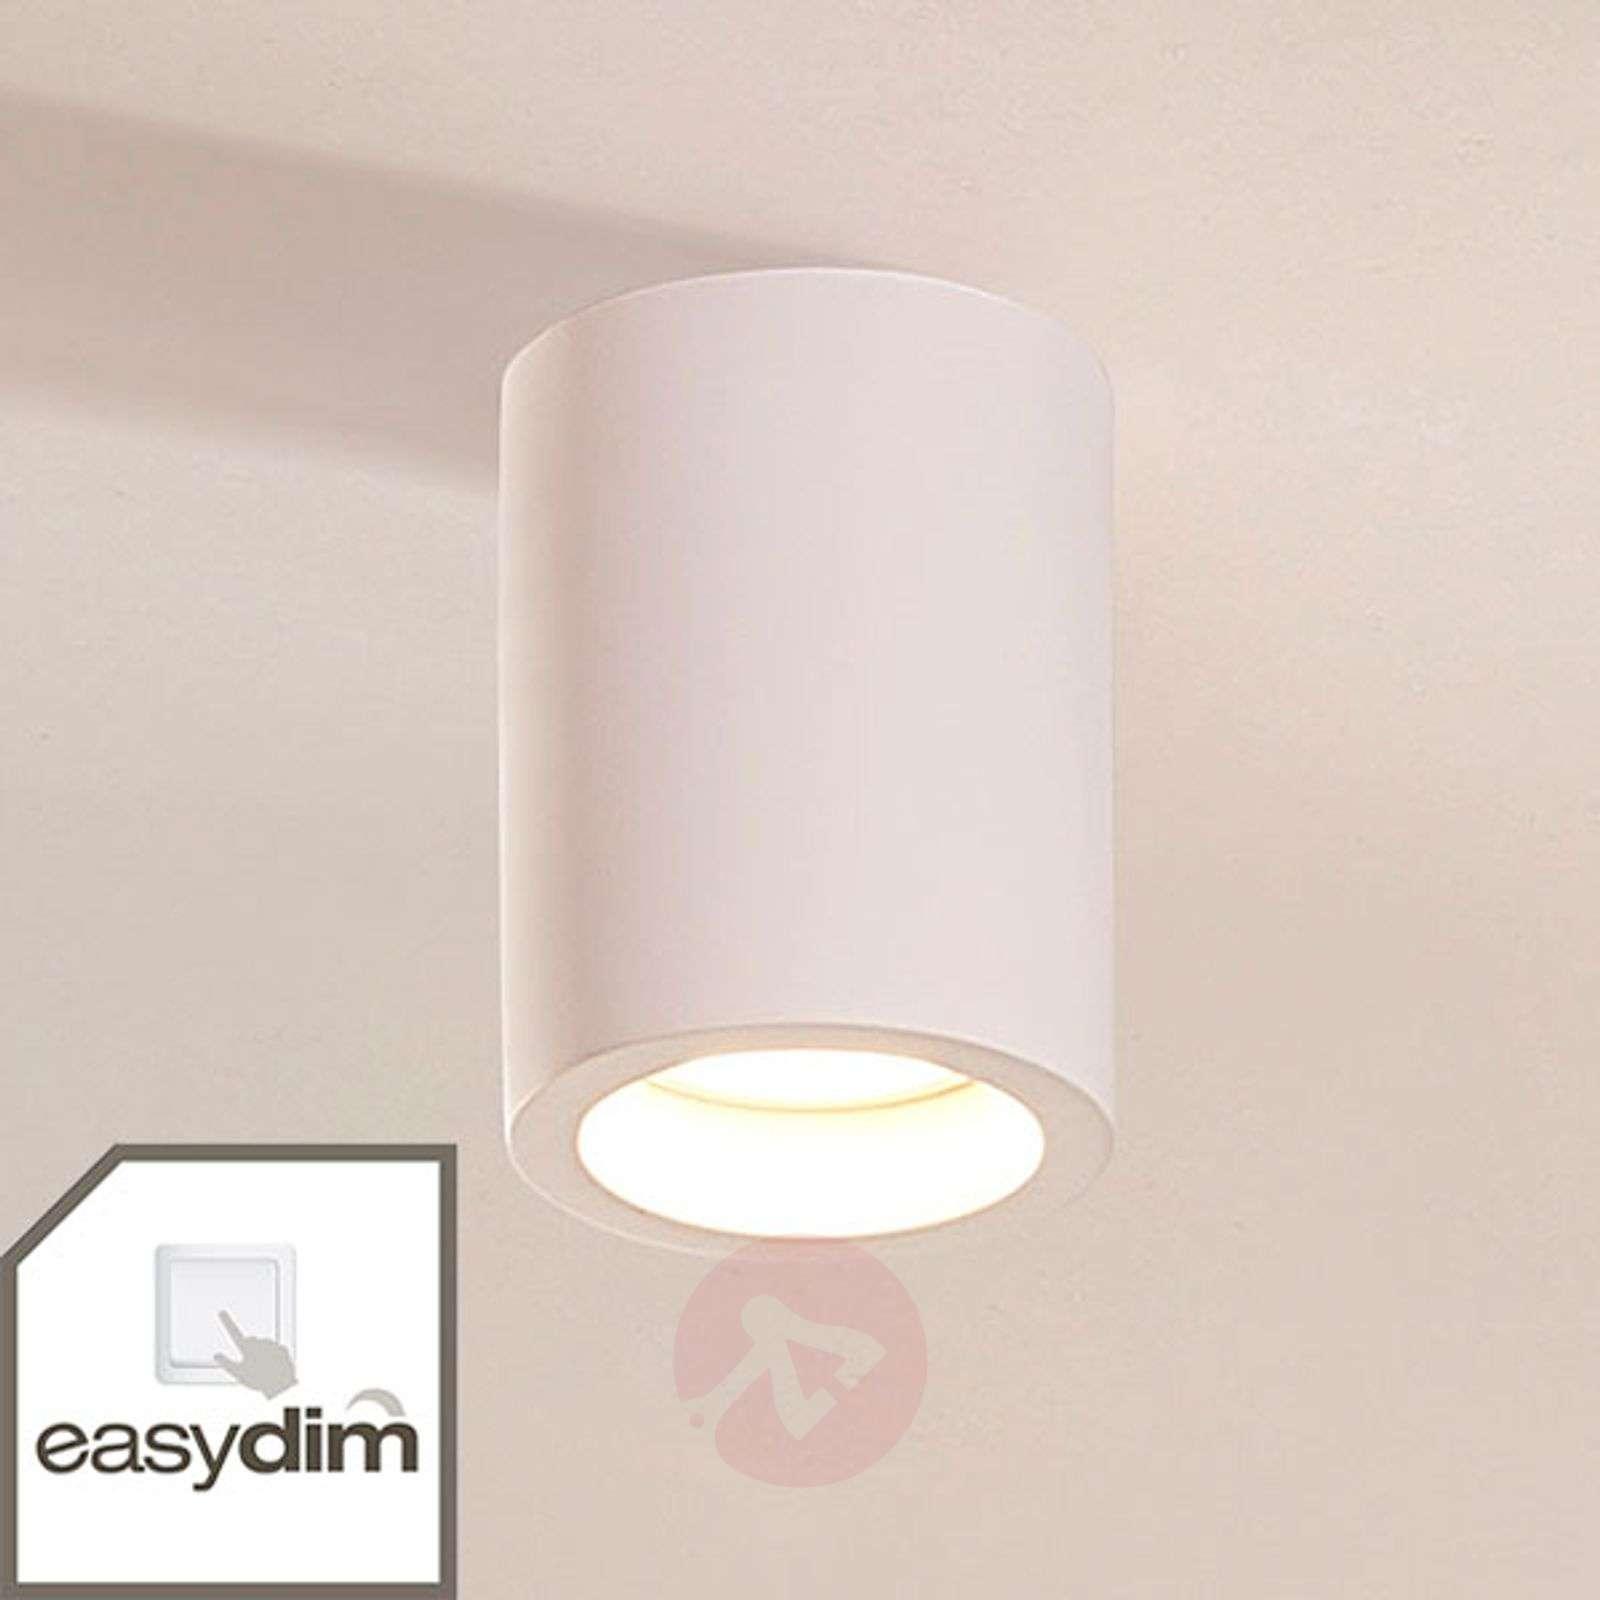 Kompakti LED-downlight Annelie, easydim-9621357-01